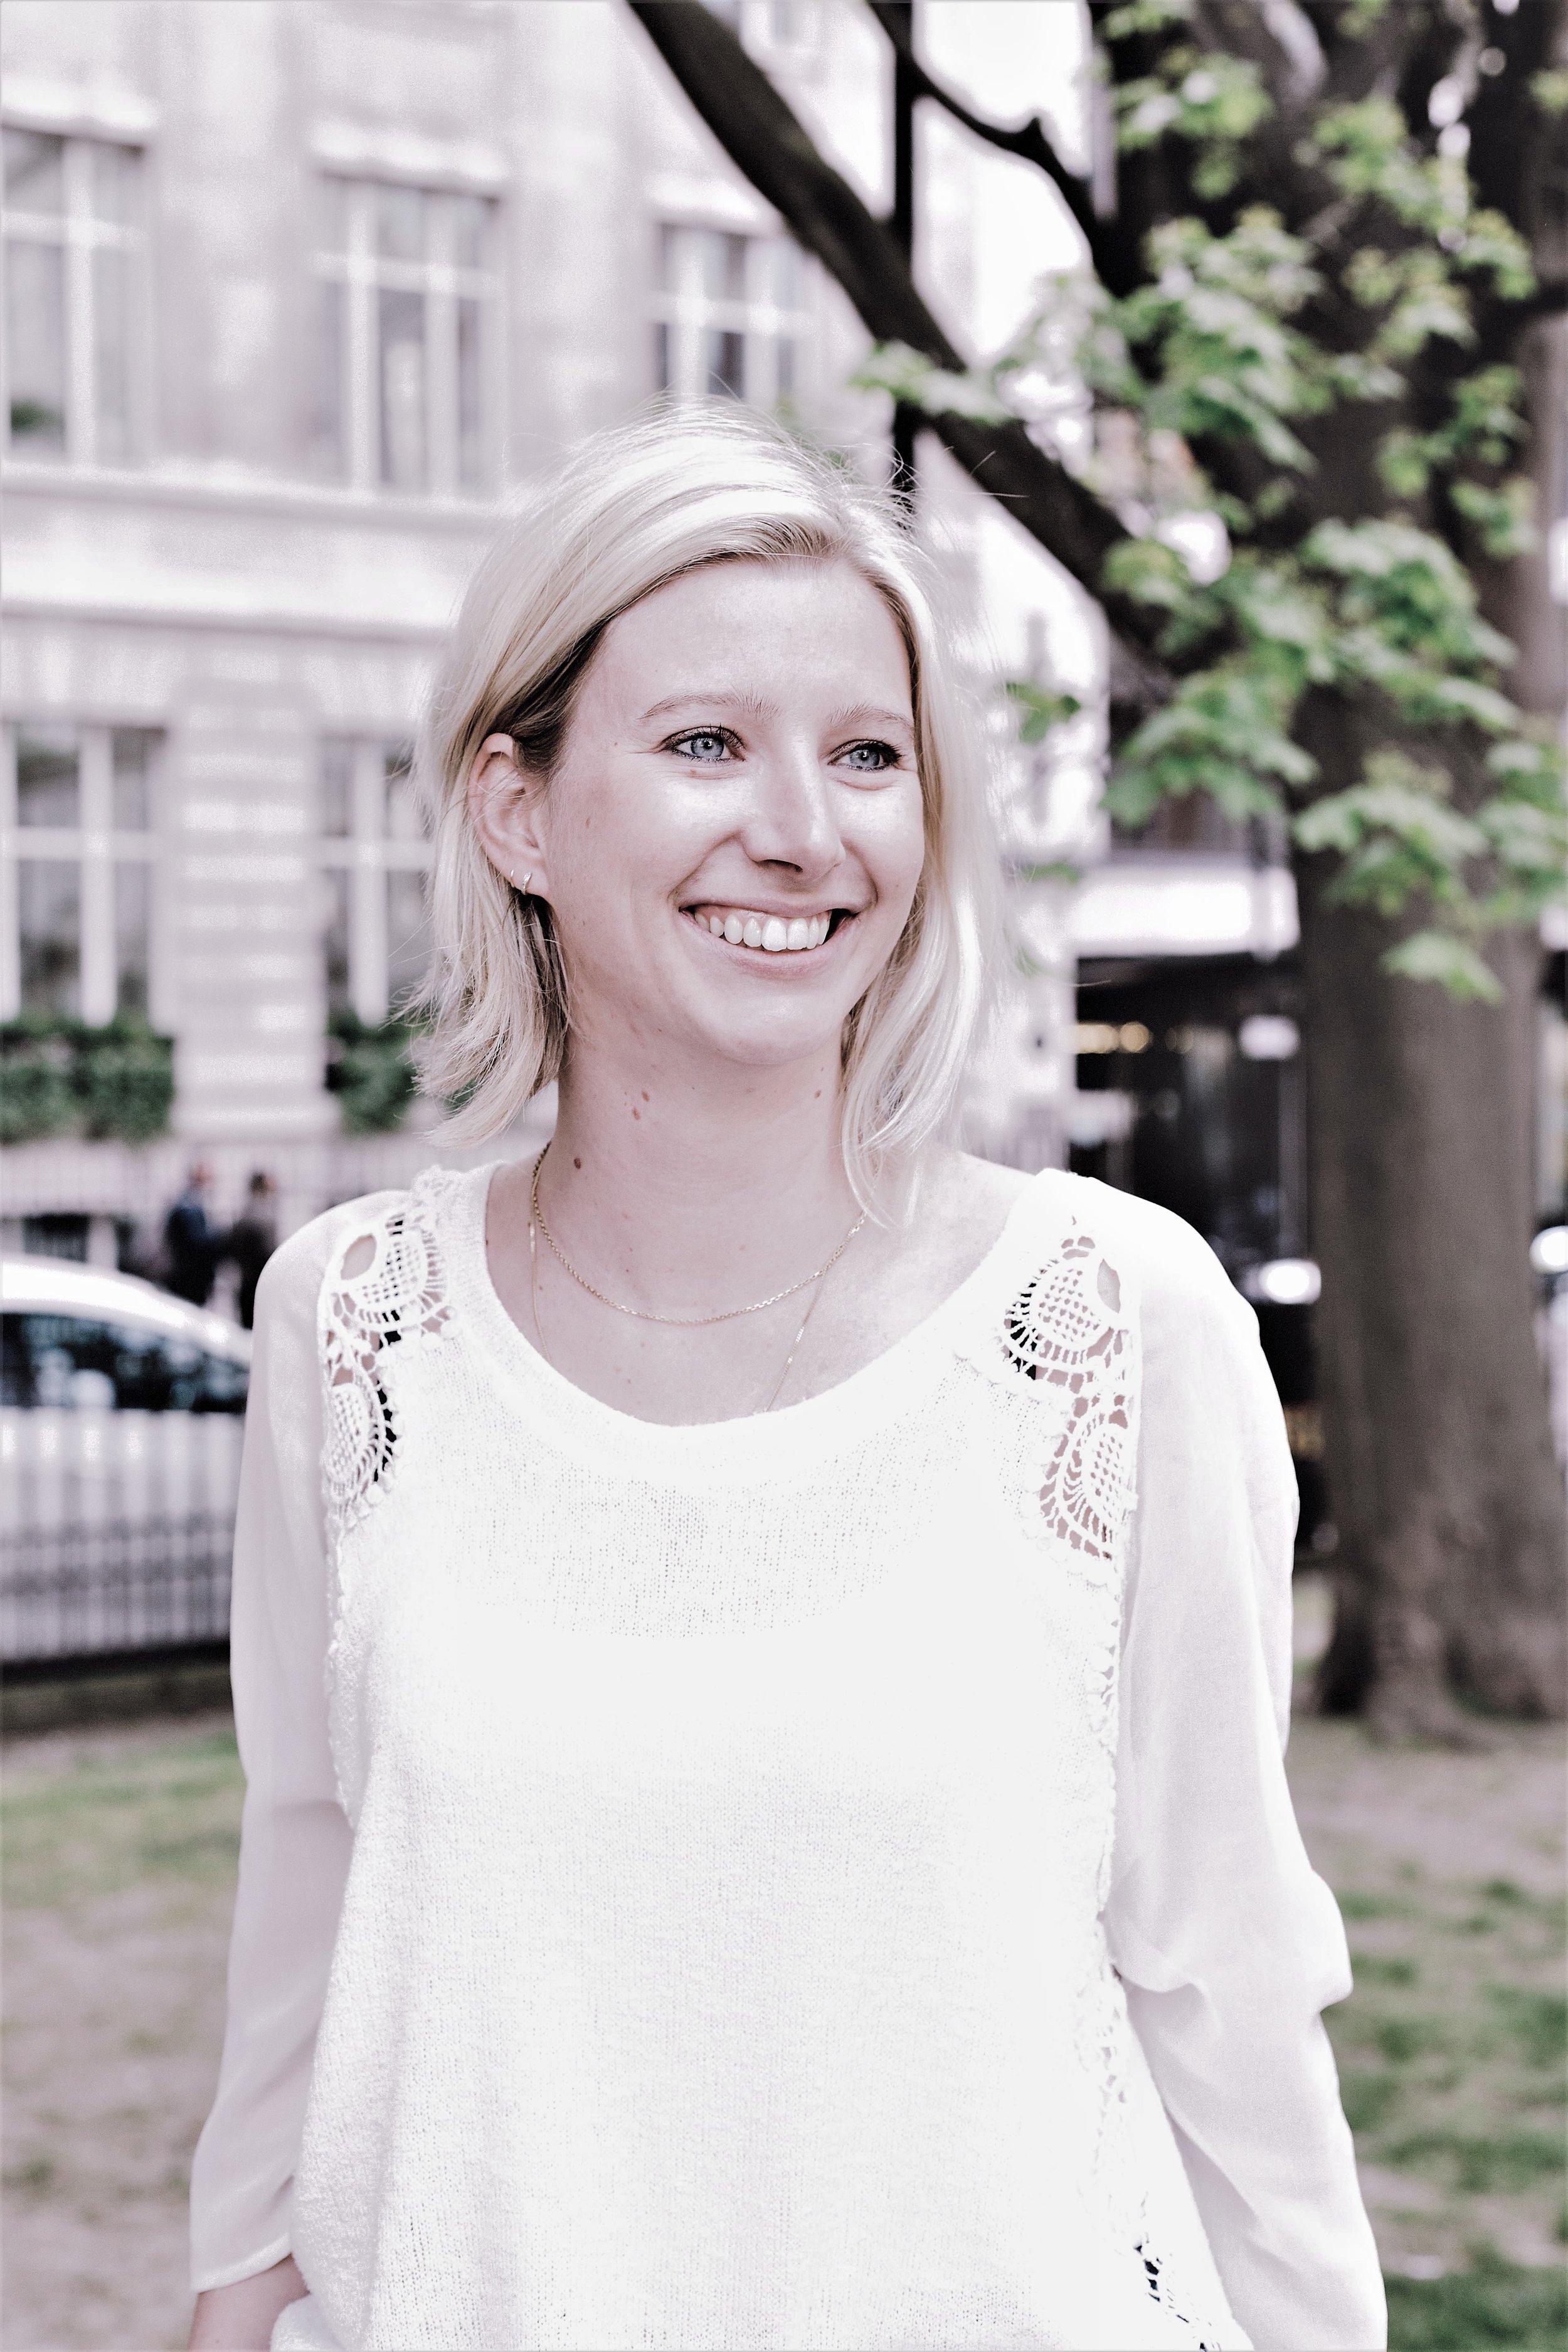 Julie Giraud, Director